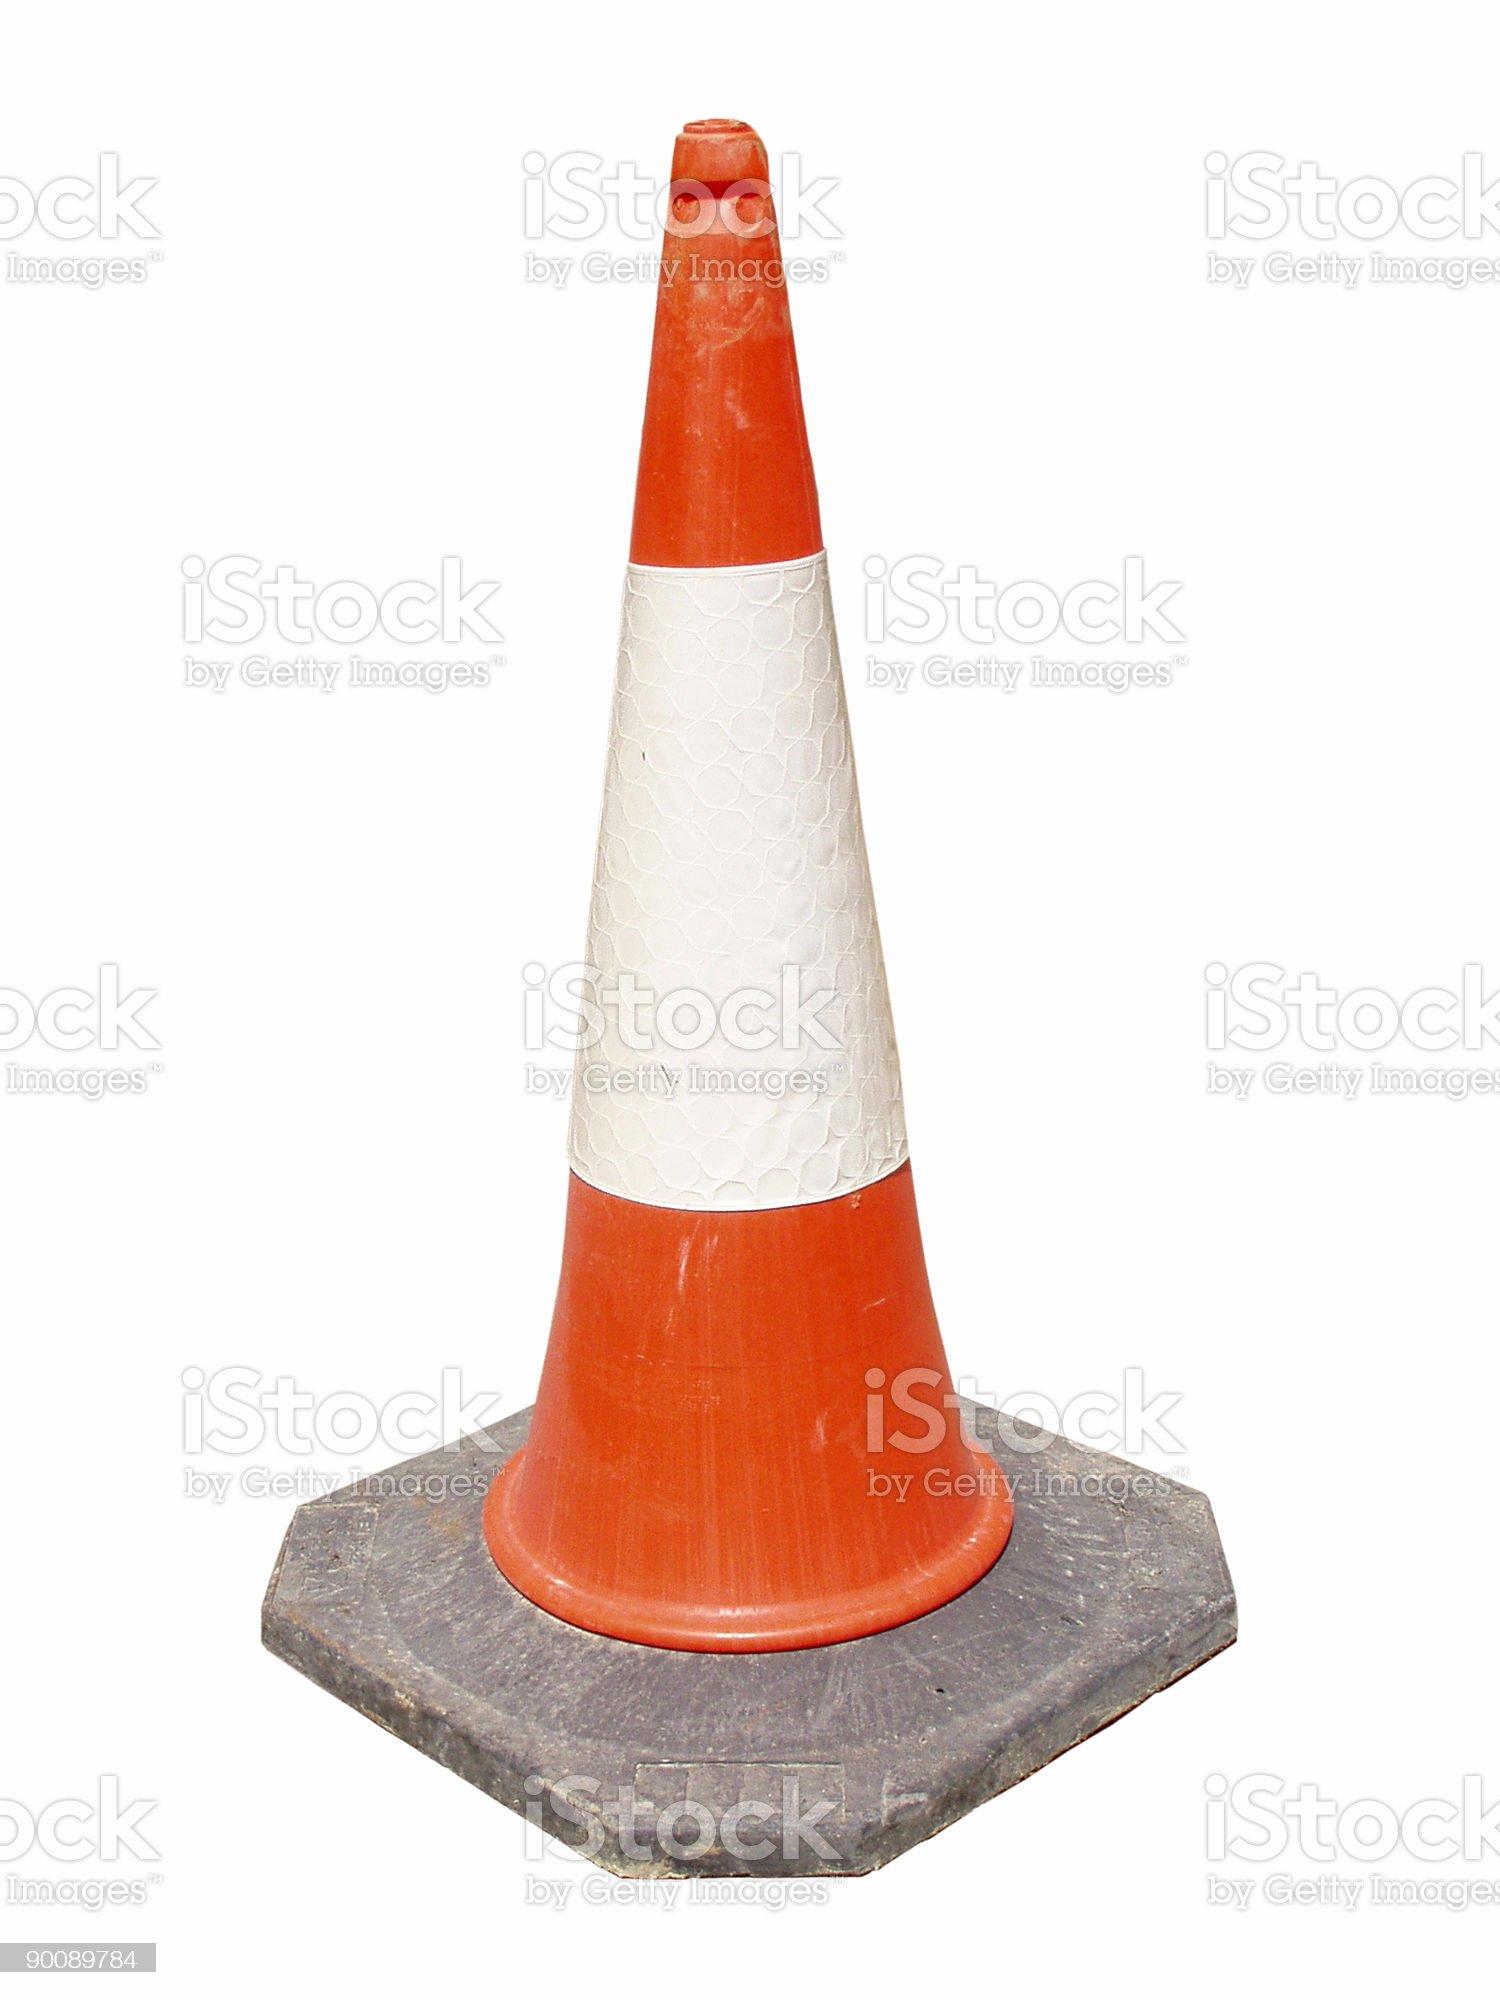 Road construction cone royalty-free stock photo